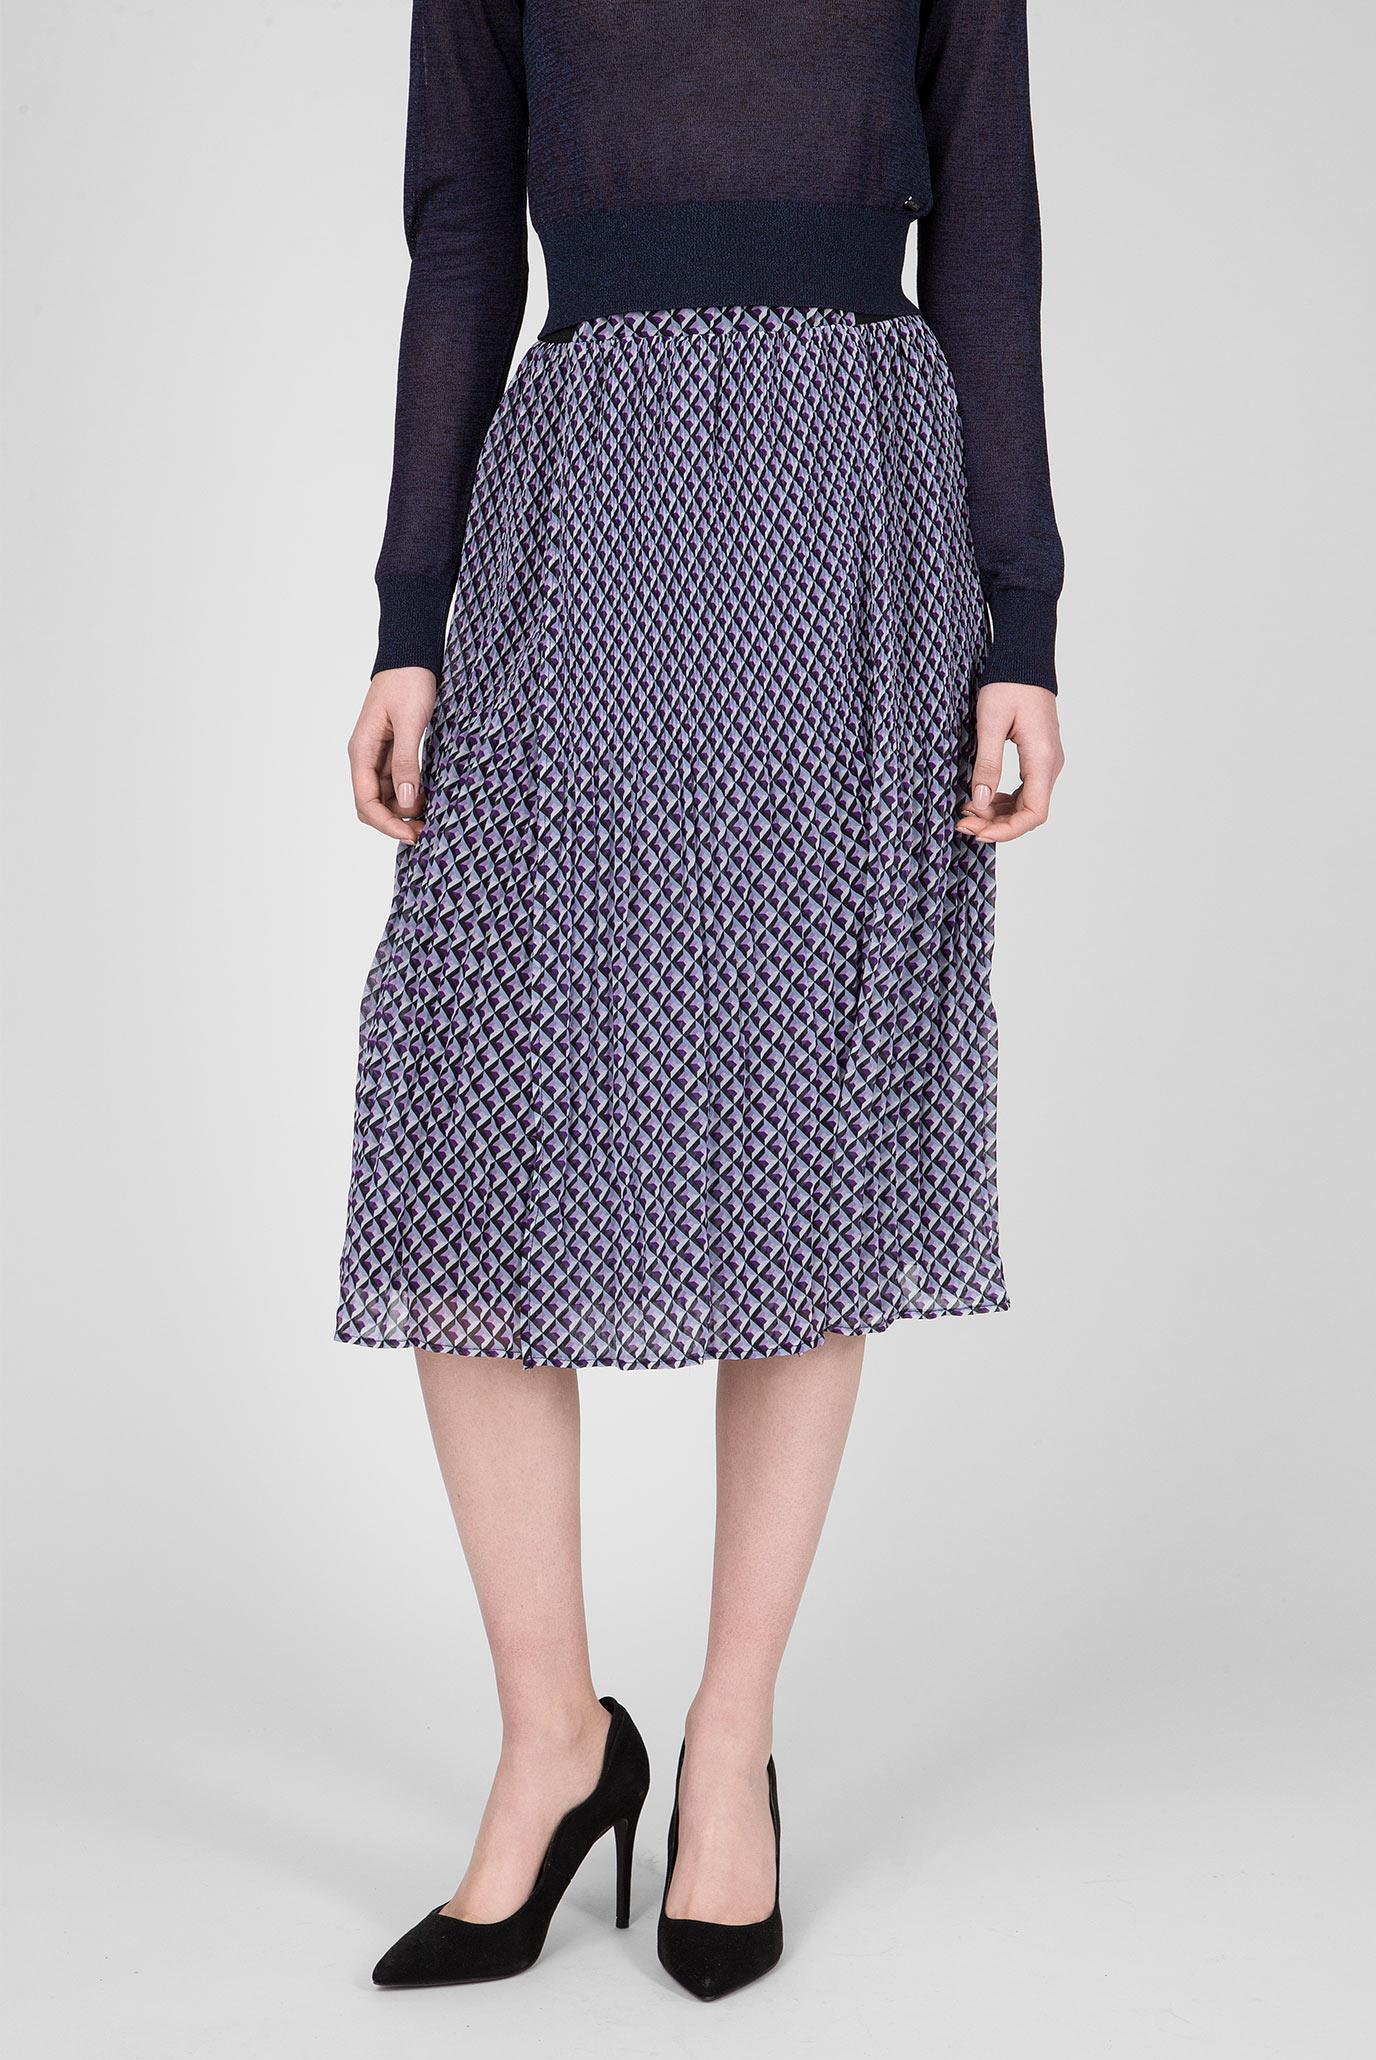 2282f40d9a6 Купить Женская фиолетовая юбка-плиссе YVONNE Pepe Jeans Pepe Jeans PL900782  – Киев